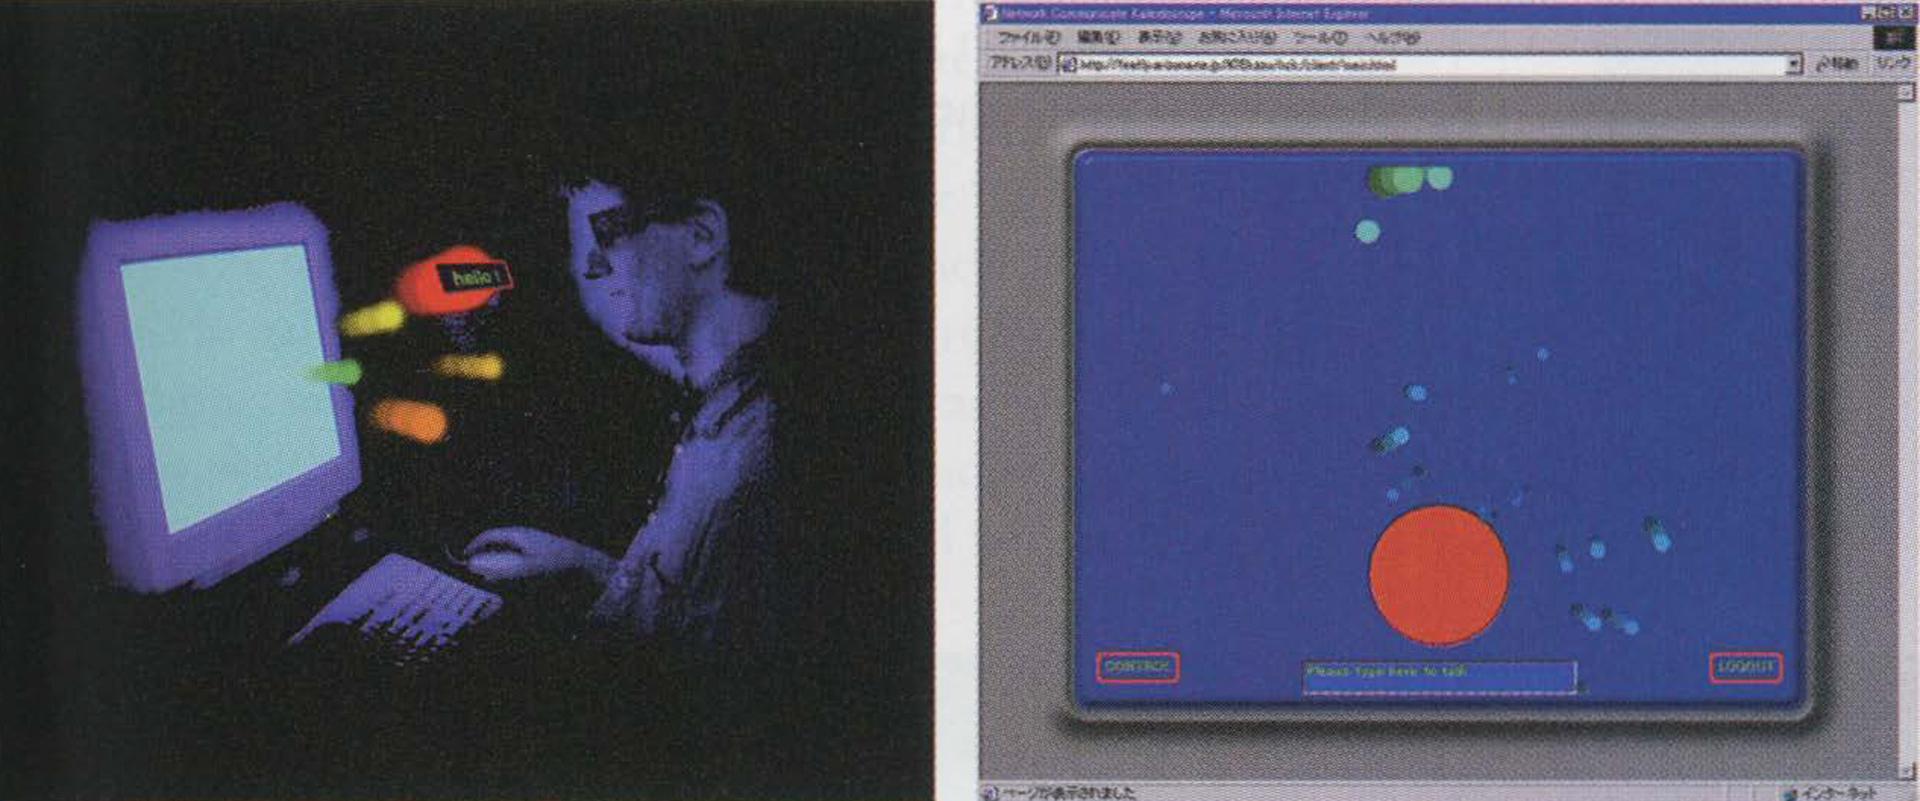 ©2001, Kazushi Mukaiyama, Network Communicate Kaleidoscope